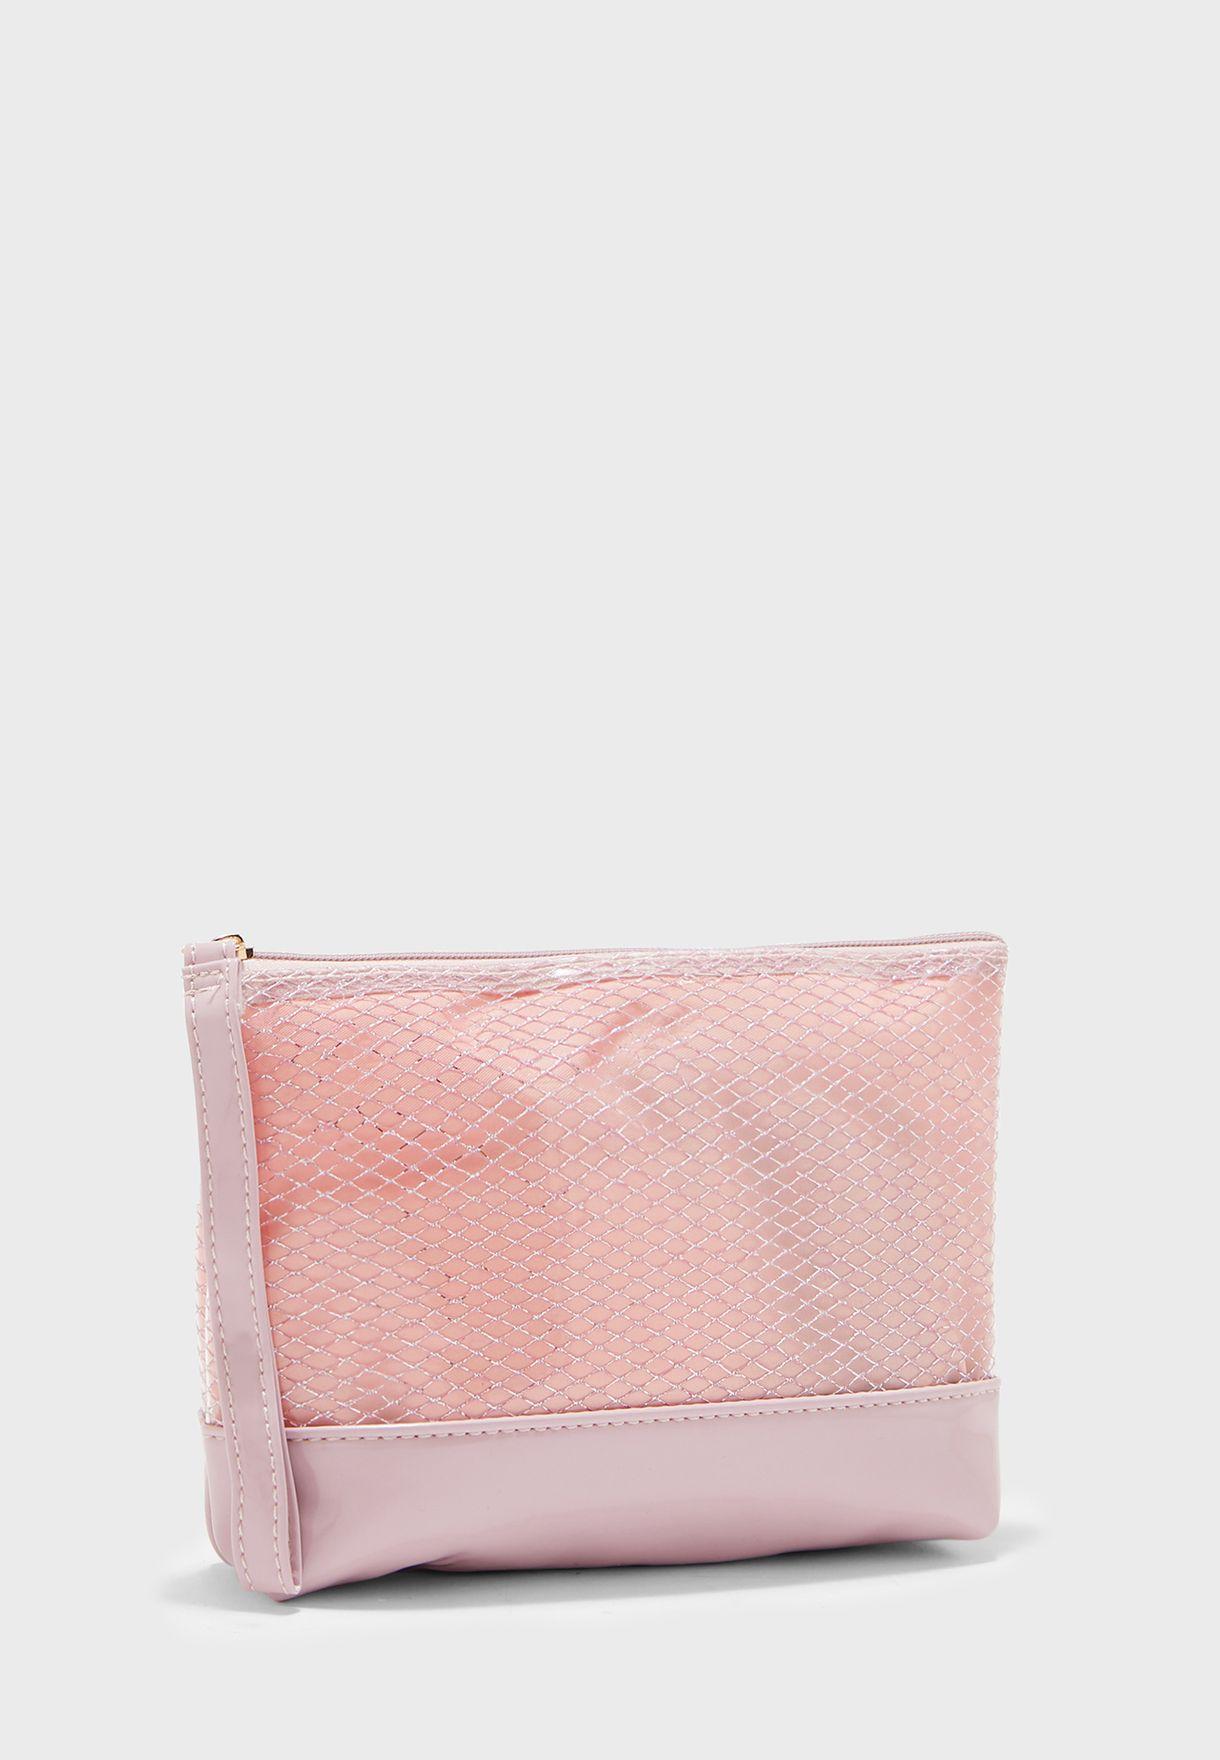 Weaved Flat bag